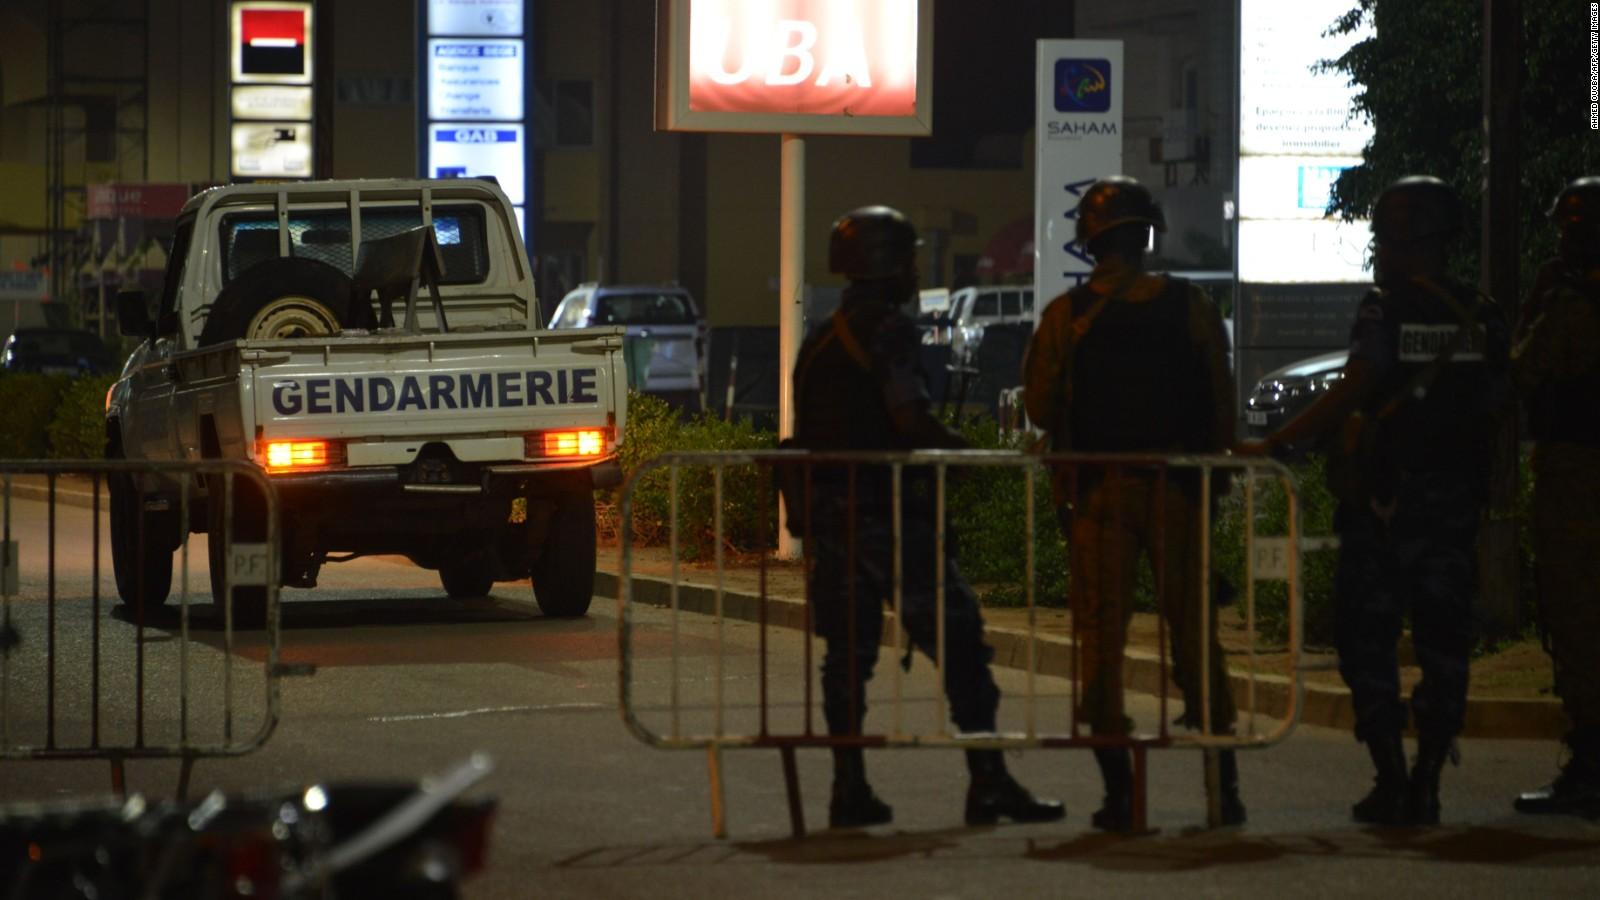 burkina faso attack: at least 18 killed in restaurant - cnn